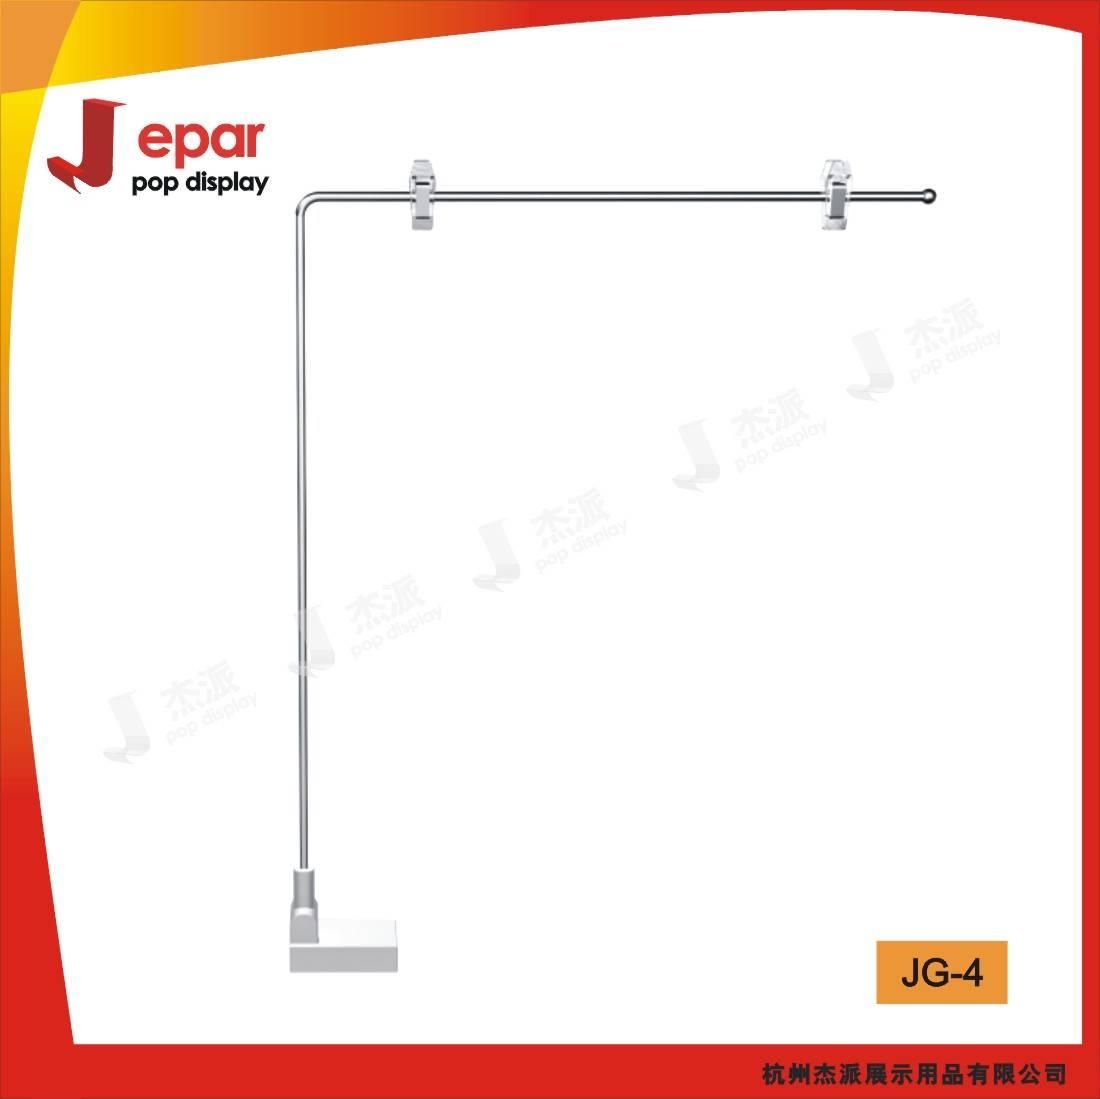 Metal adjustable rotating magnetic tabletop poster display stand